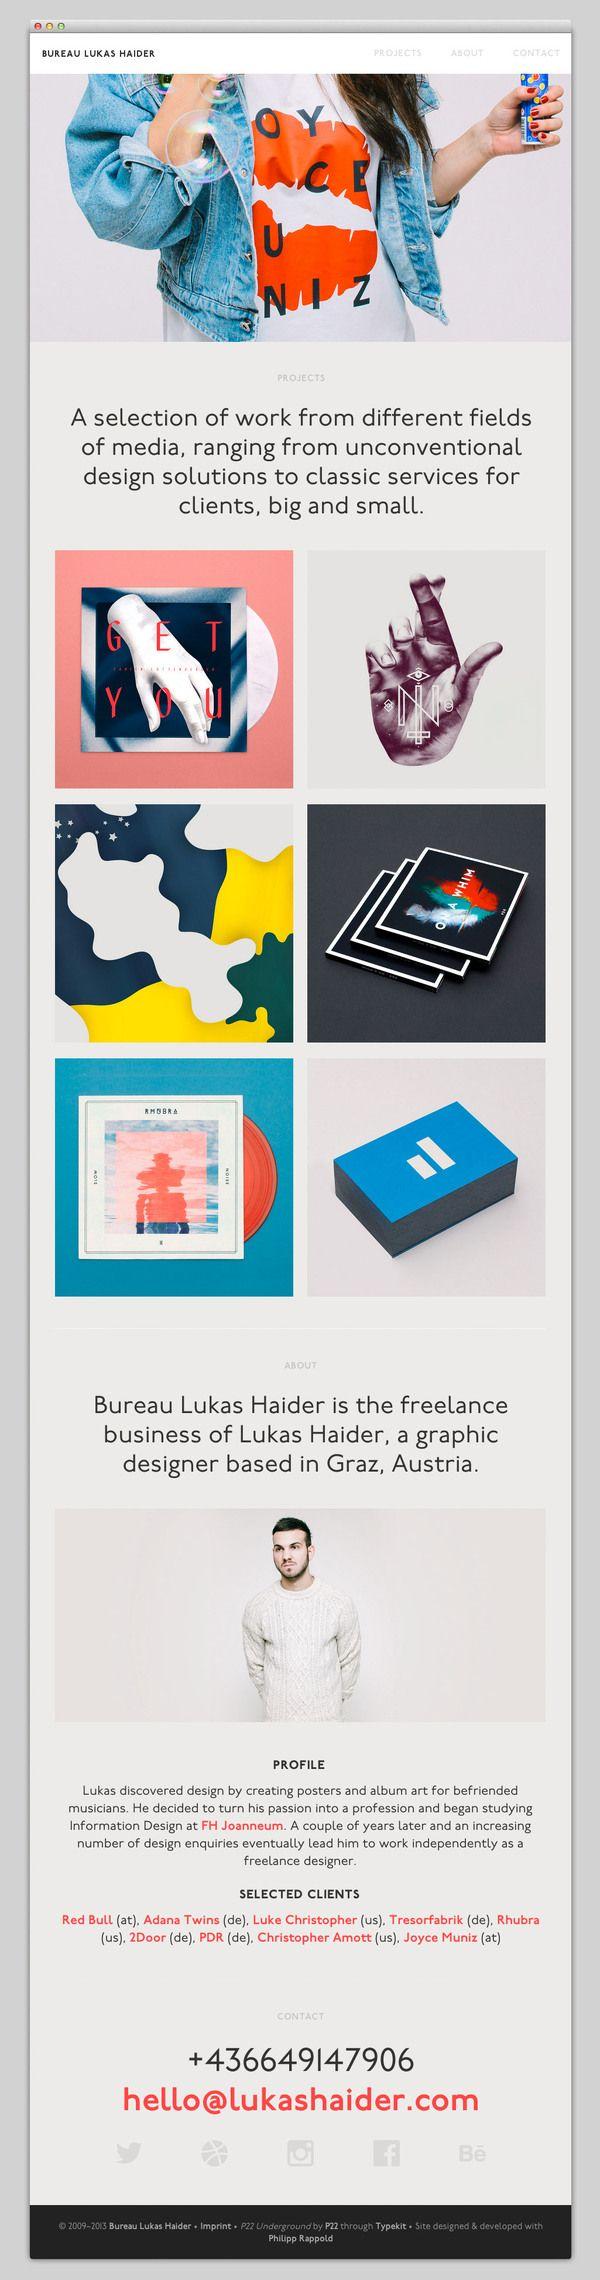 Bureau Lukas Haider